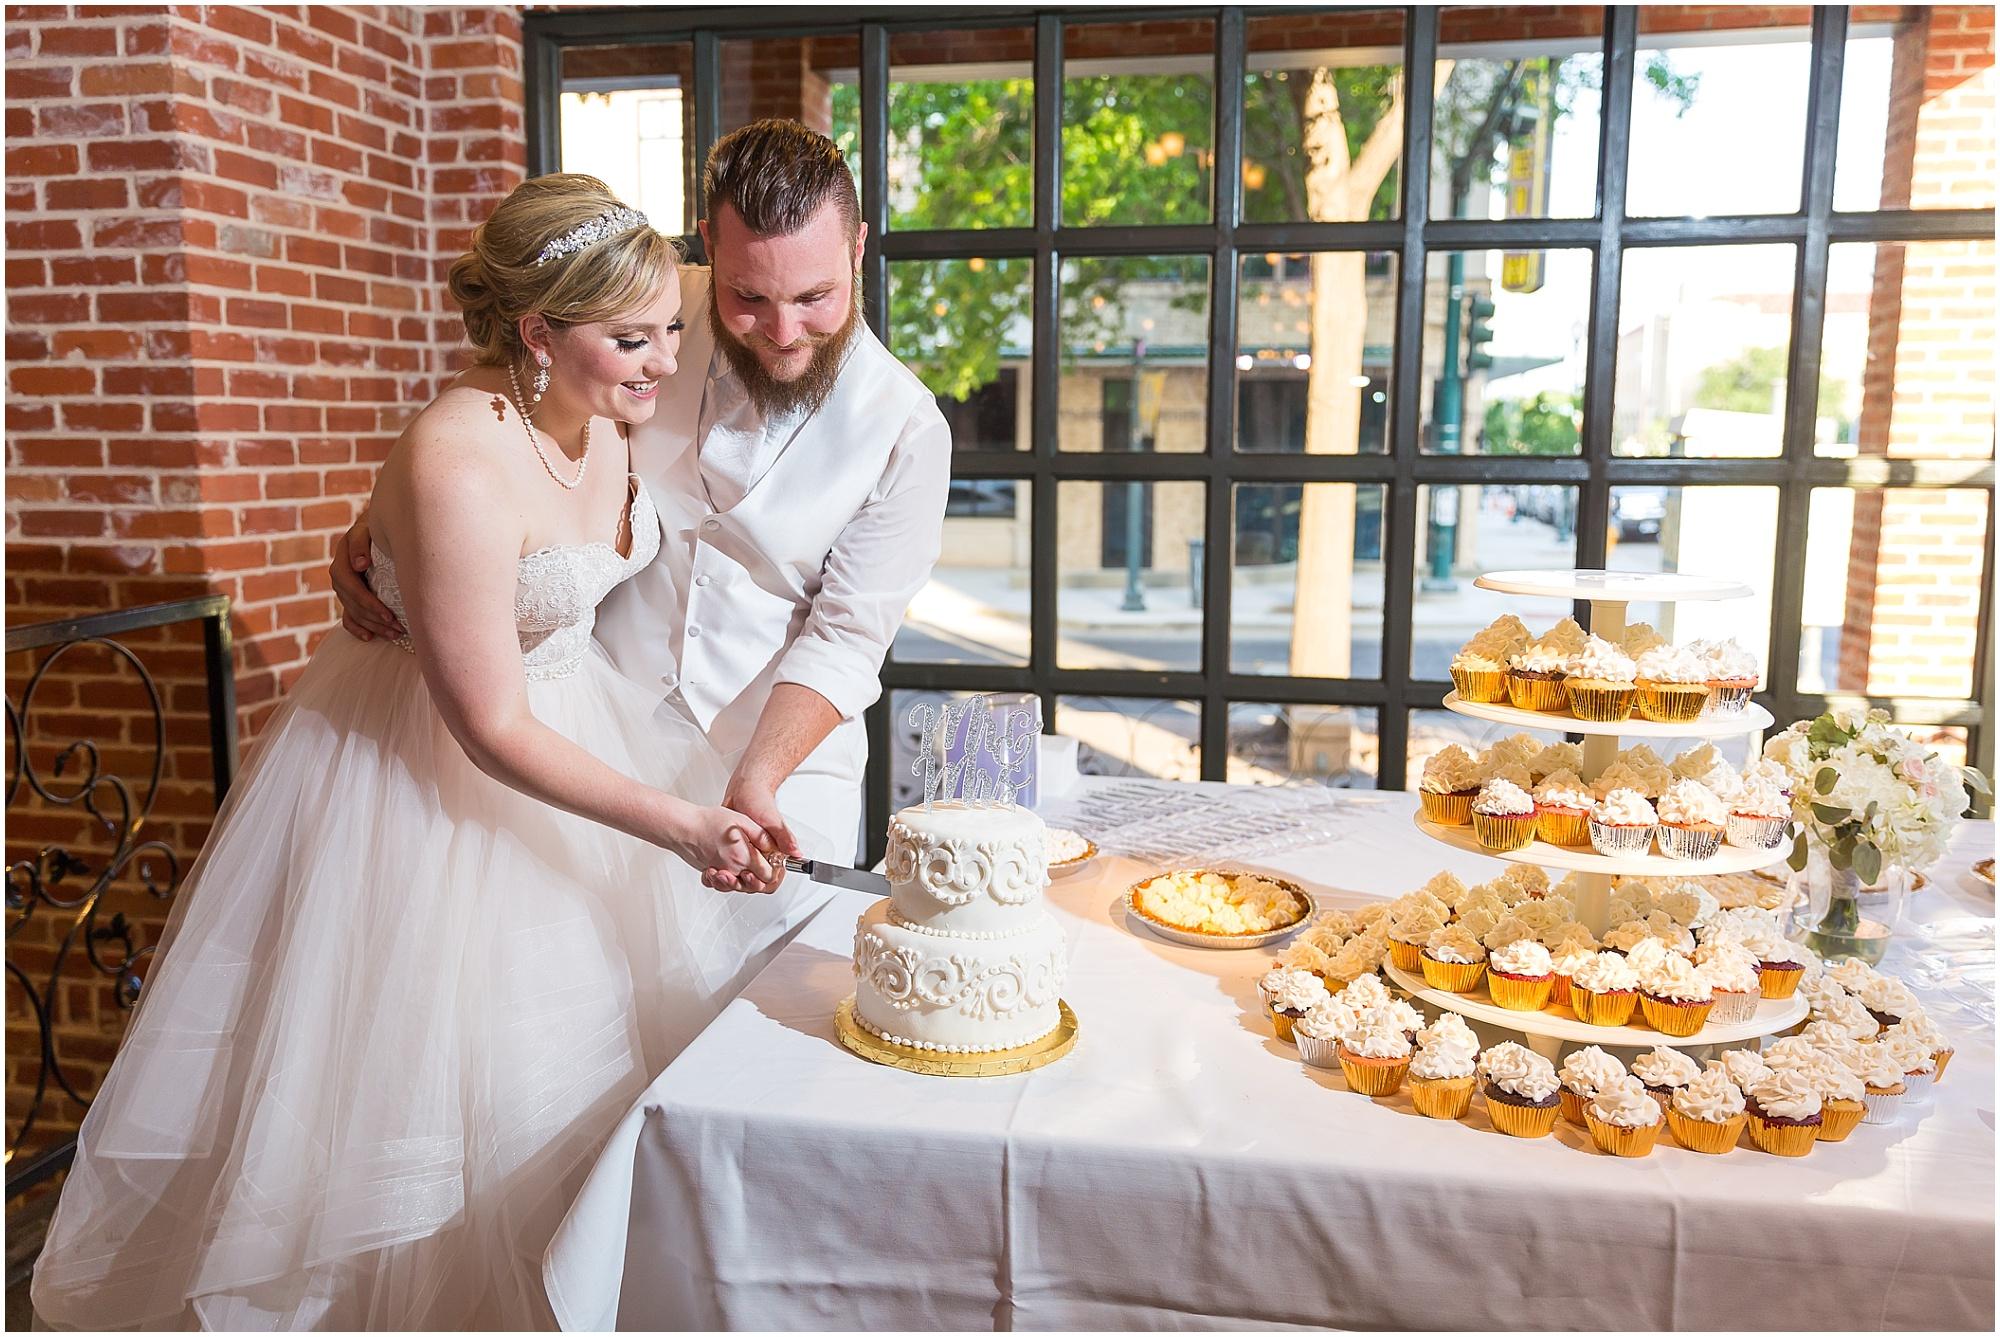 Wedding at The Palladium in Waco, Texas - www.jasonandmelaina.com